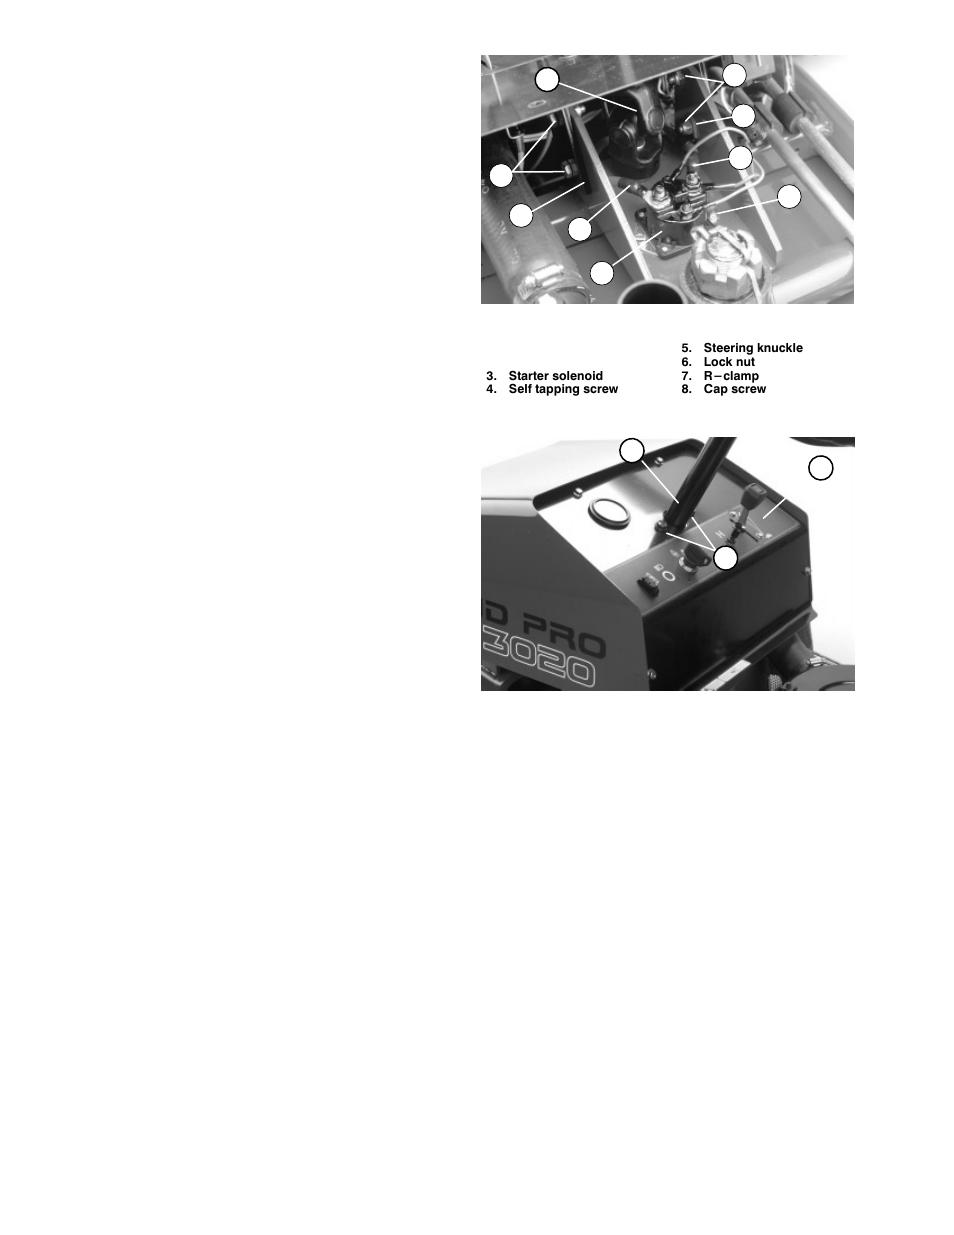 hight resolution of toro sand pro 5020 user manual page 160 170 original modetoro sand pro 5020 user manual